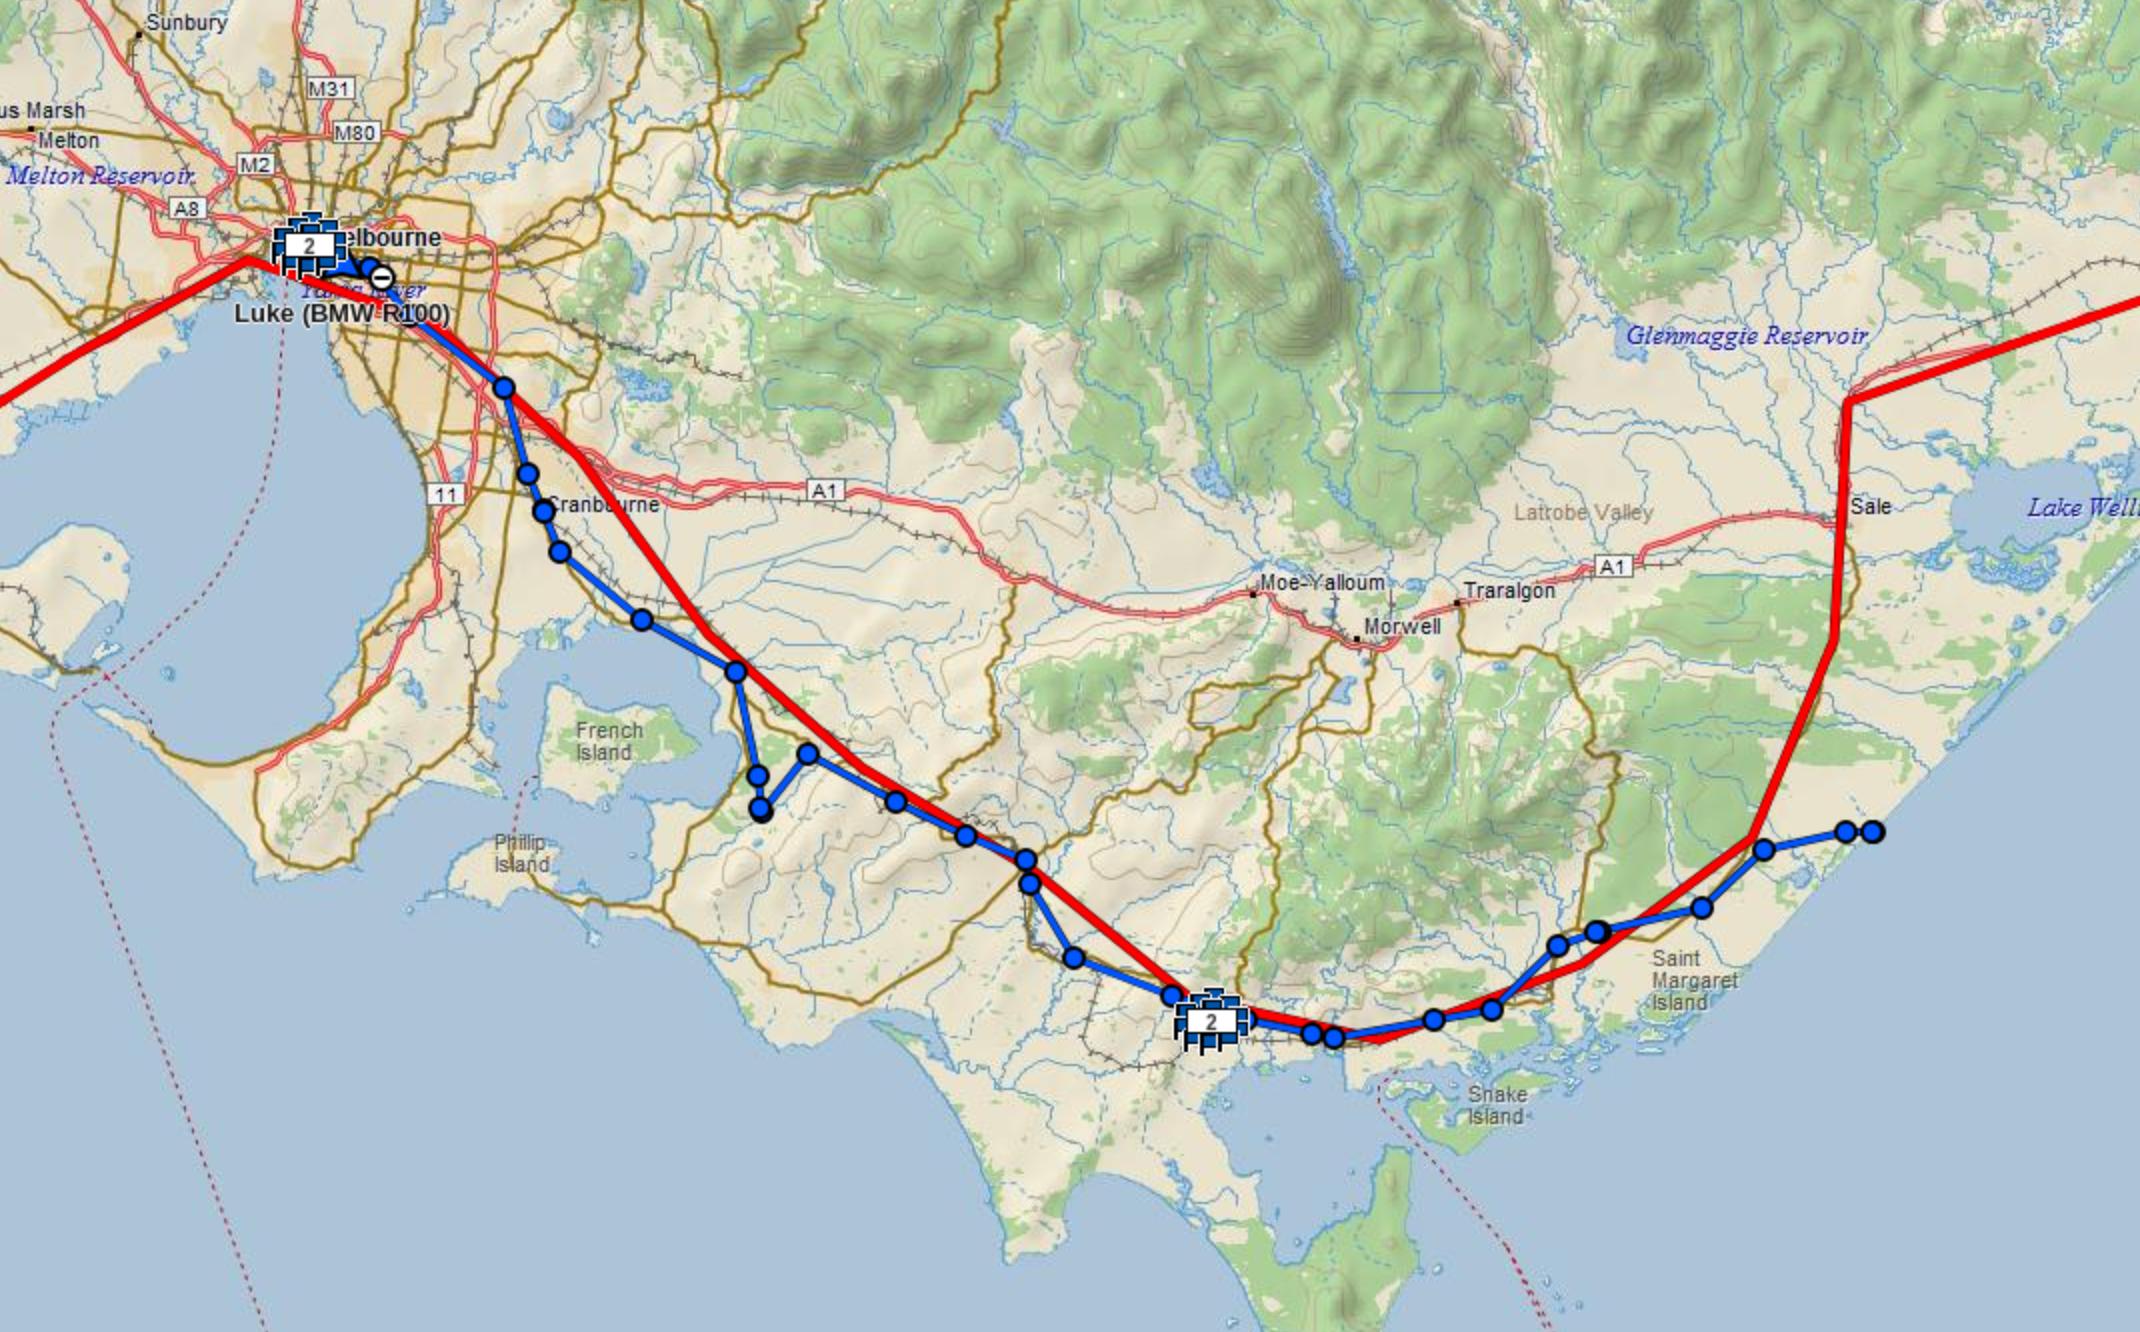 Perth Trip – Day 5 – 2019/12/06